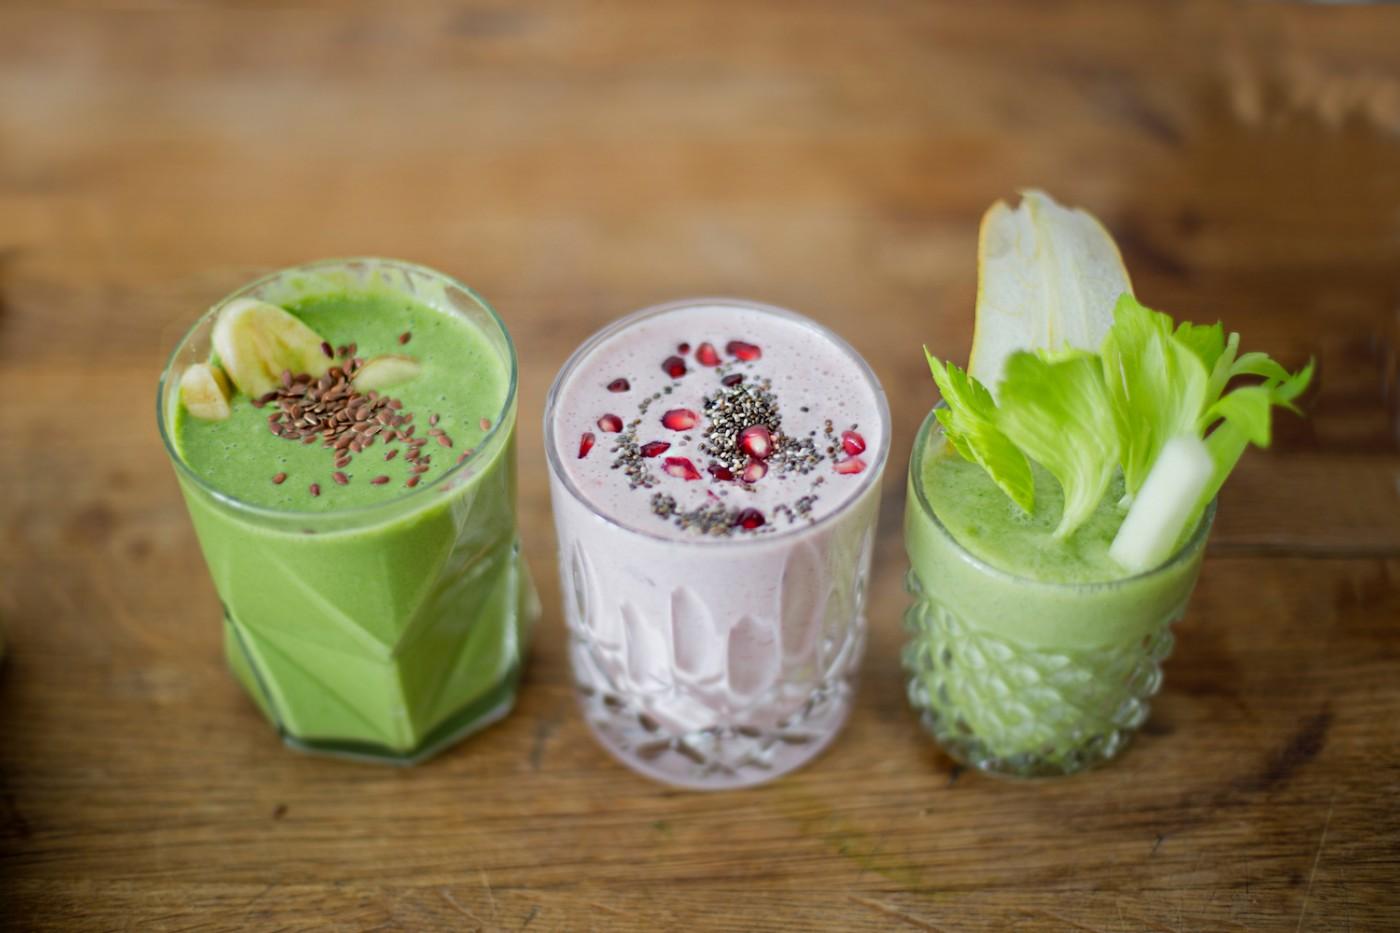 hangover smoothies _ smoothies gegen kater _ kater smoothies _ smoothies für die feiertage